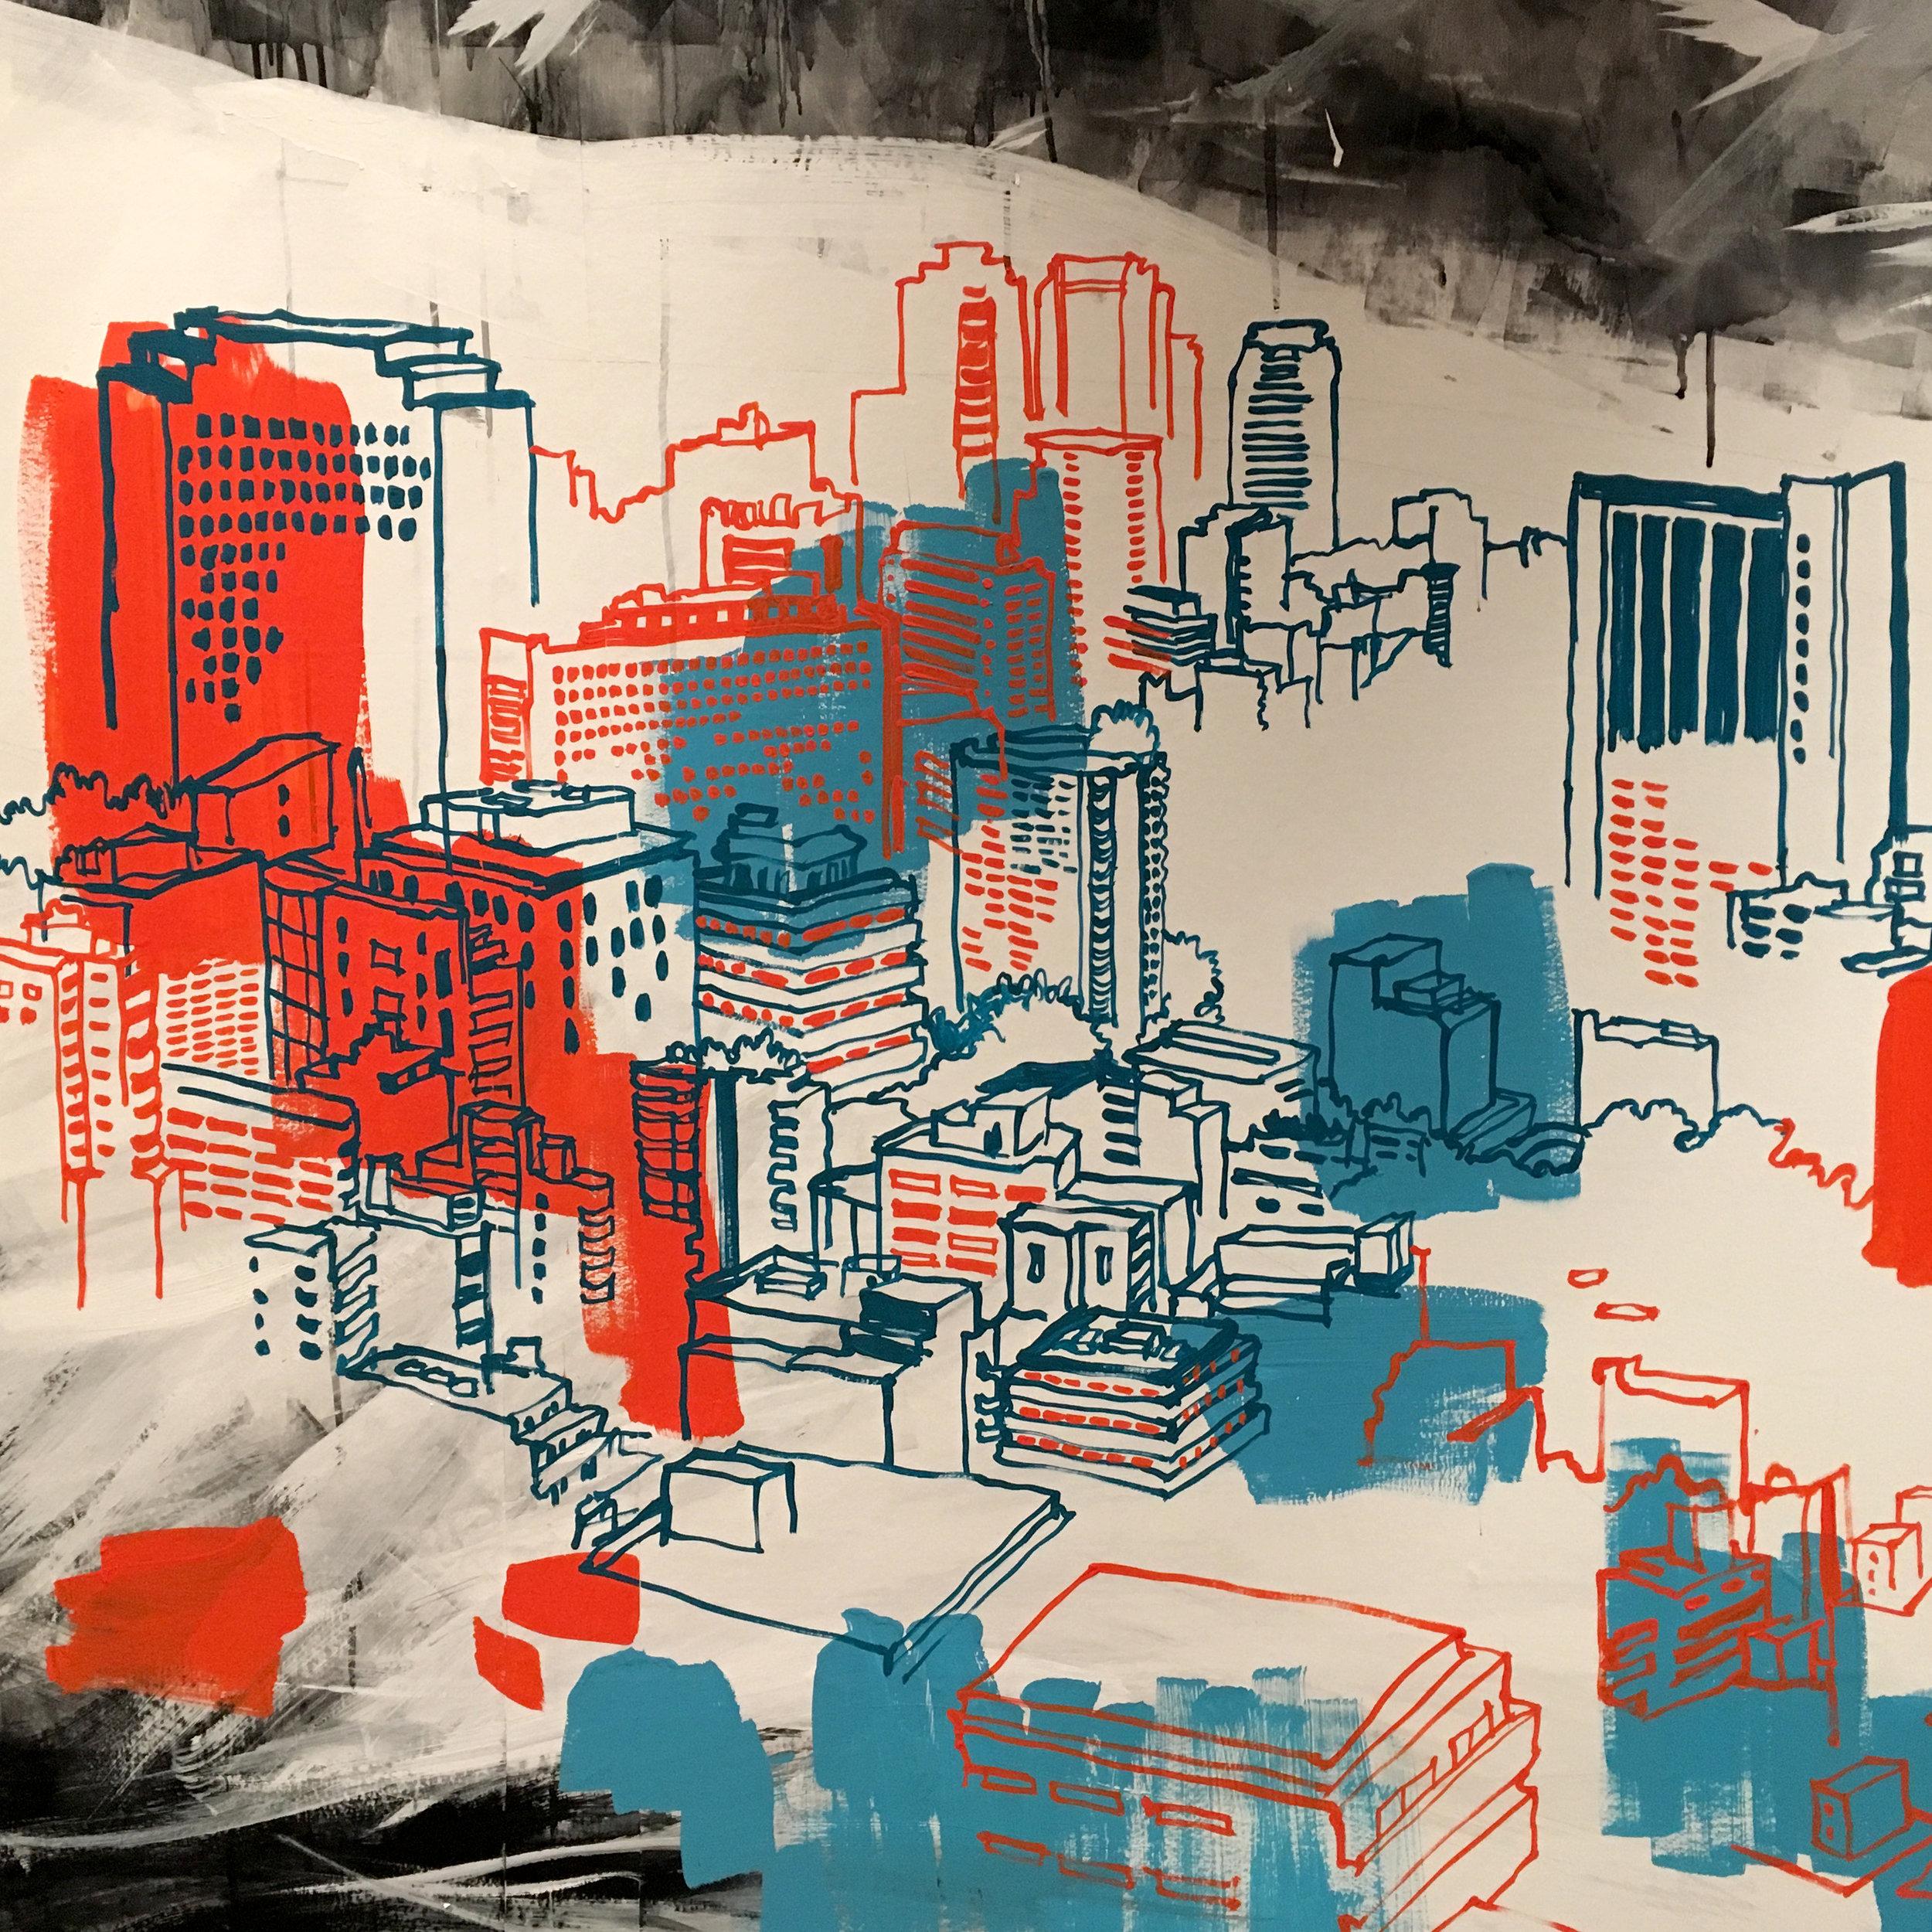 RAN_Mural2.jpg